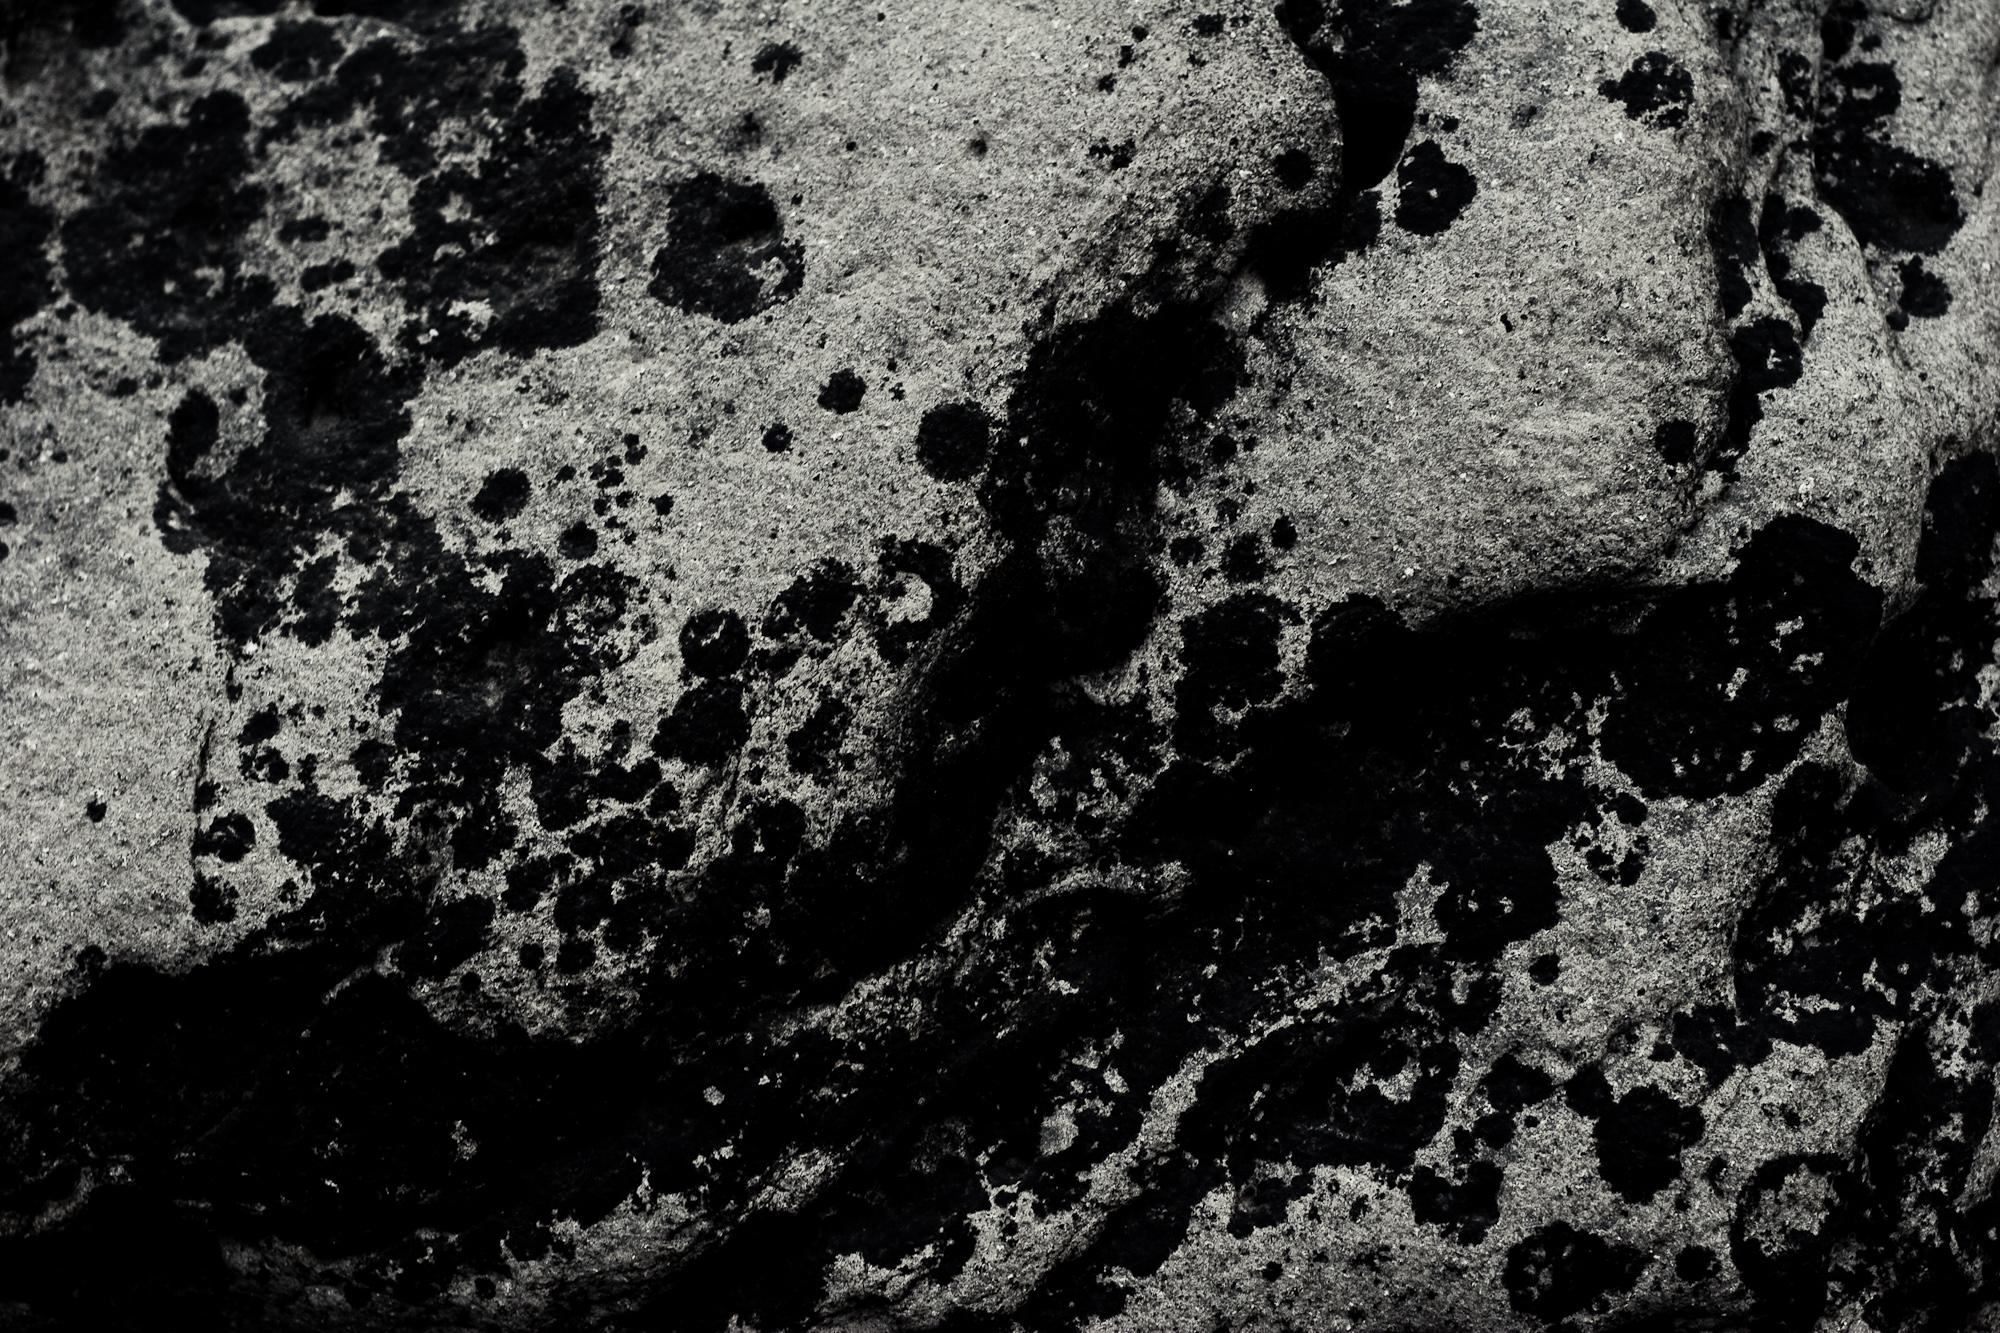 Light Rock Surface, Abstract, Black, Dark, Grunge, HQ Photo